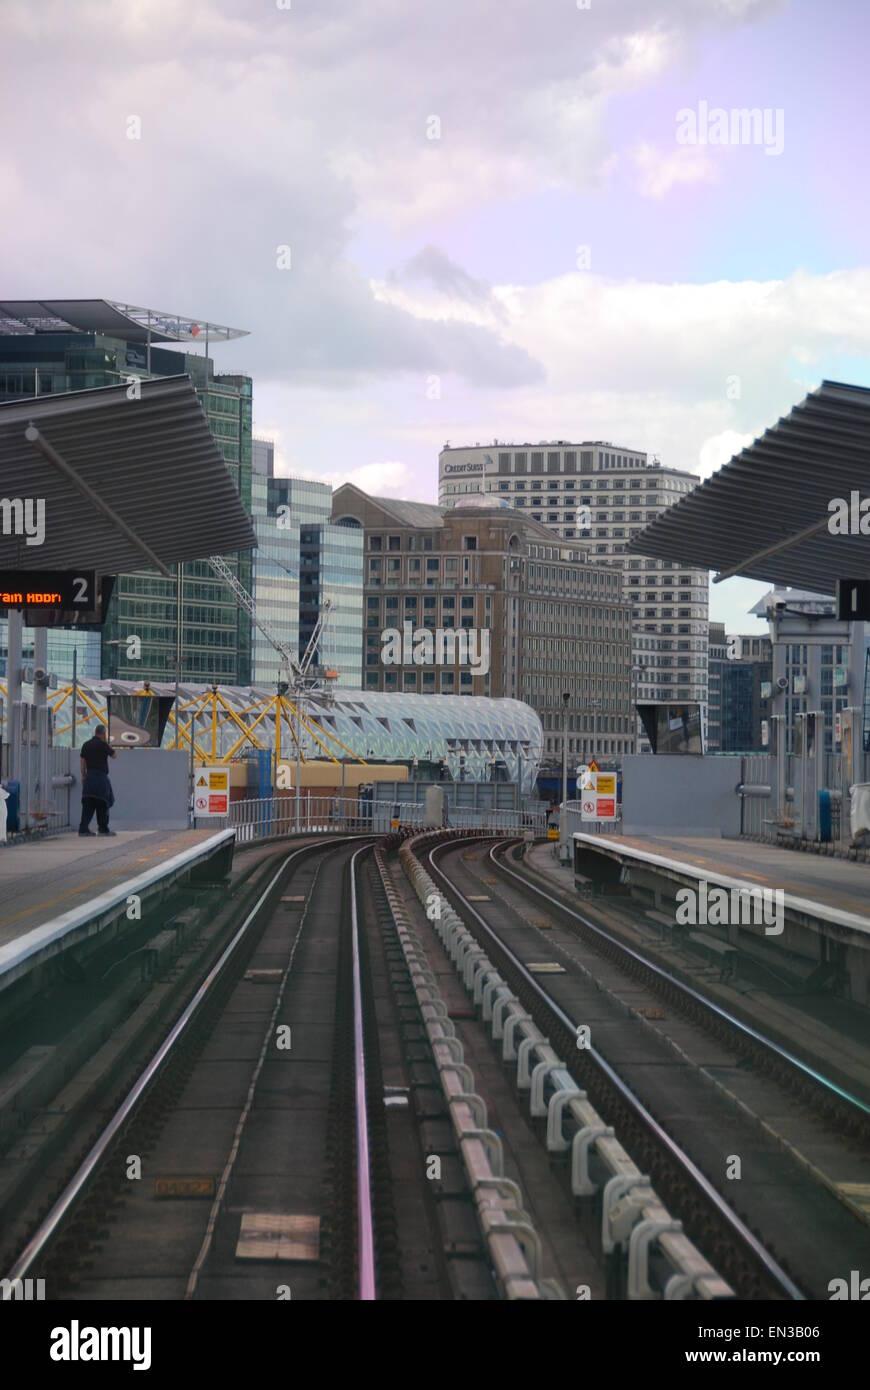 Poplar Docklands Light Railway Station London UK - Stock Image